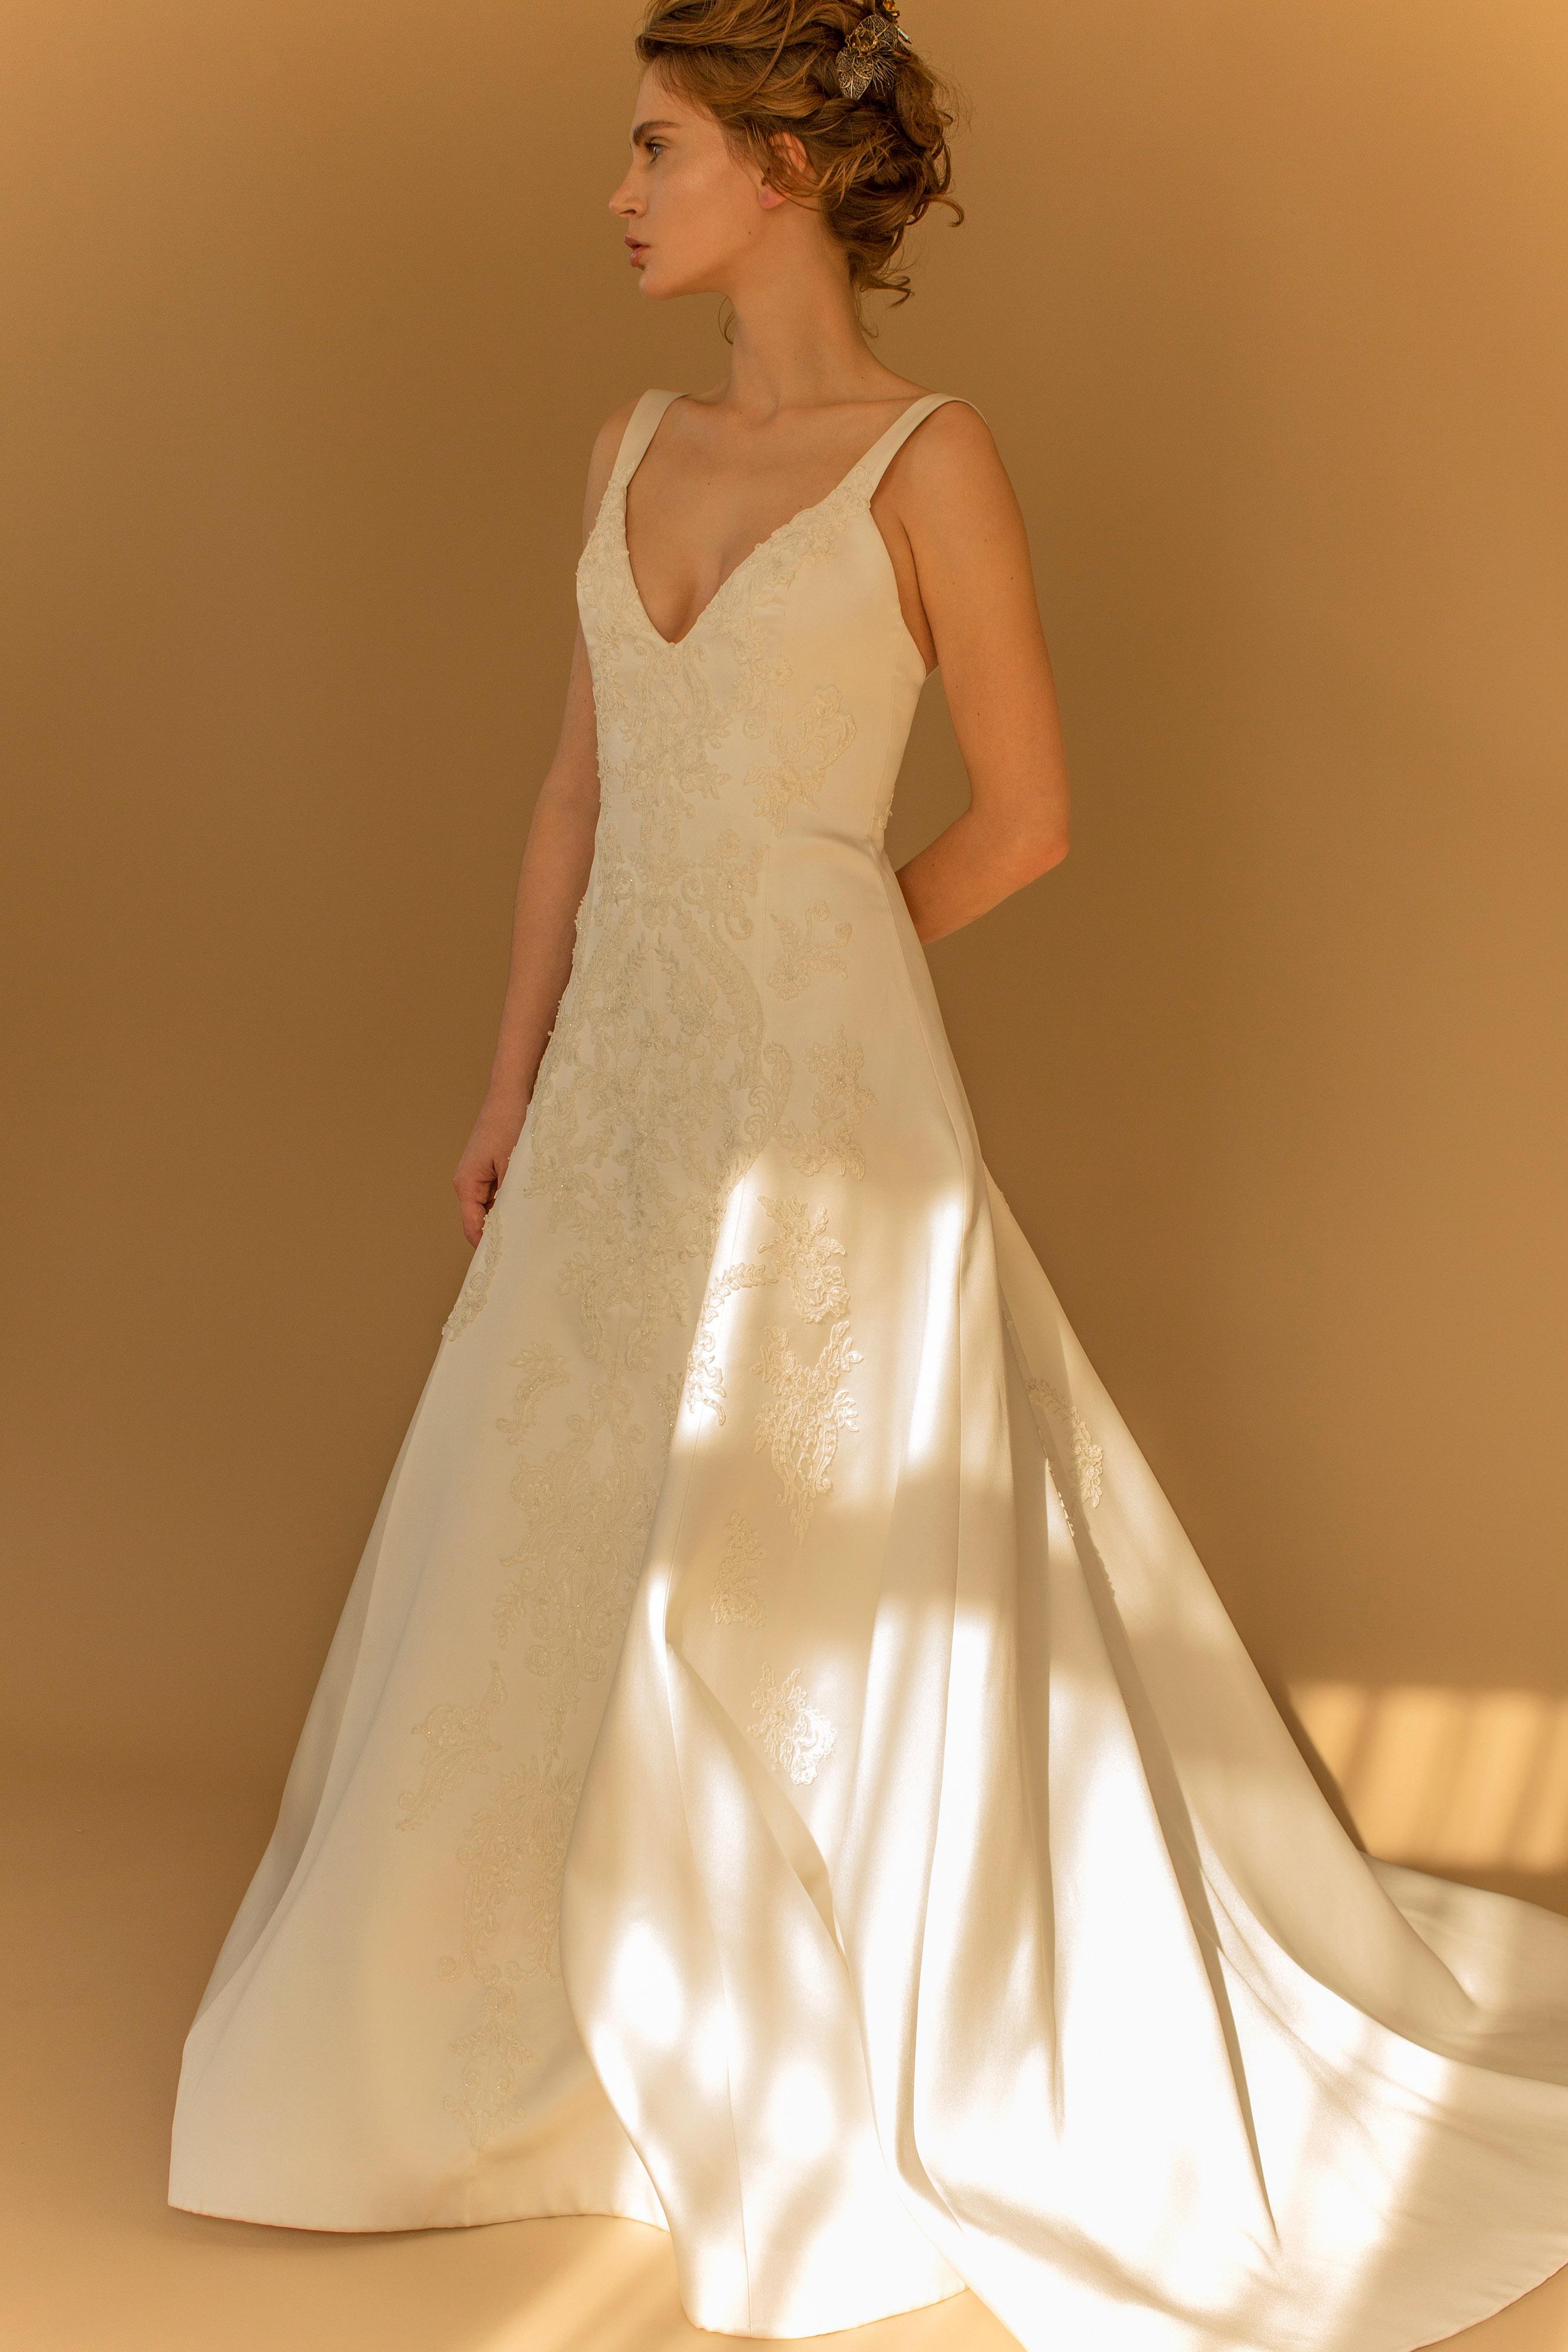 francesca miranda wedding dress fall 2018 v-neck sleeveless a-line